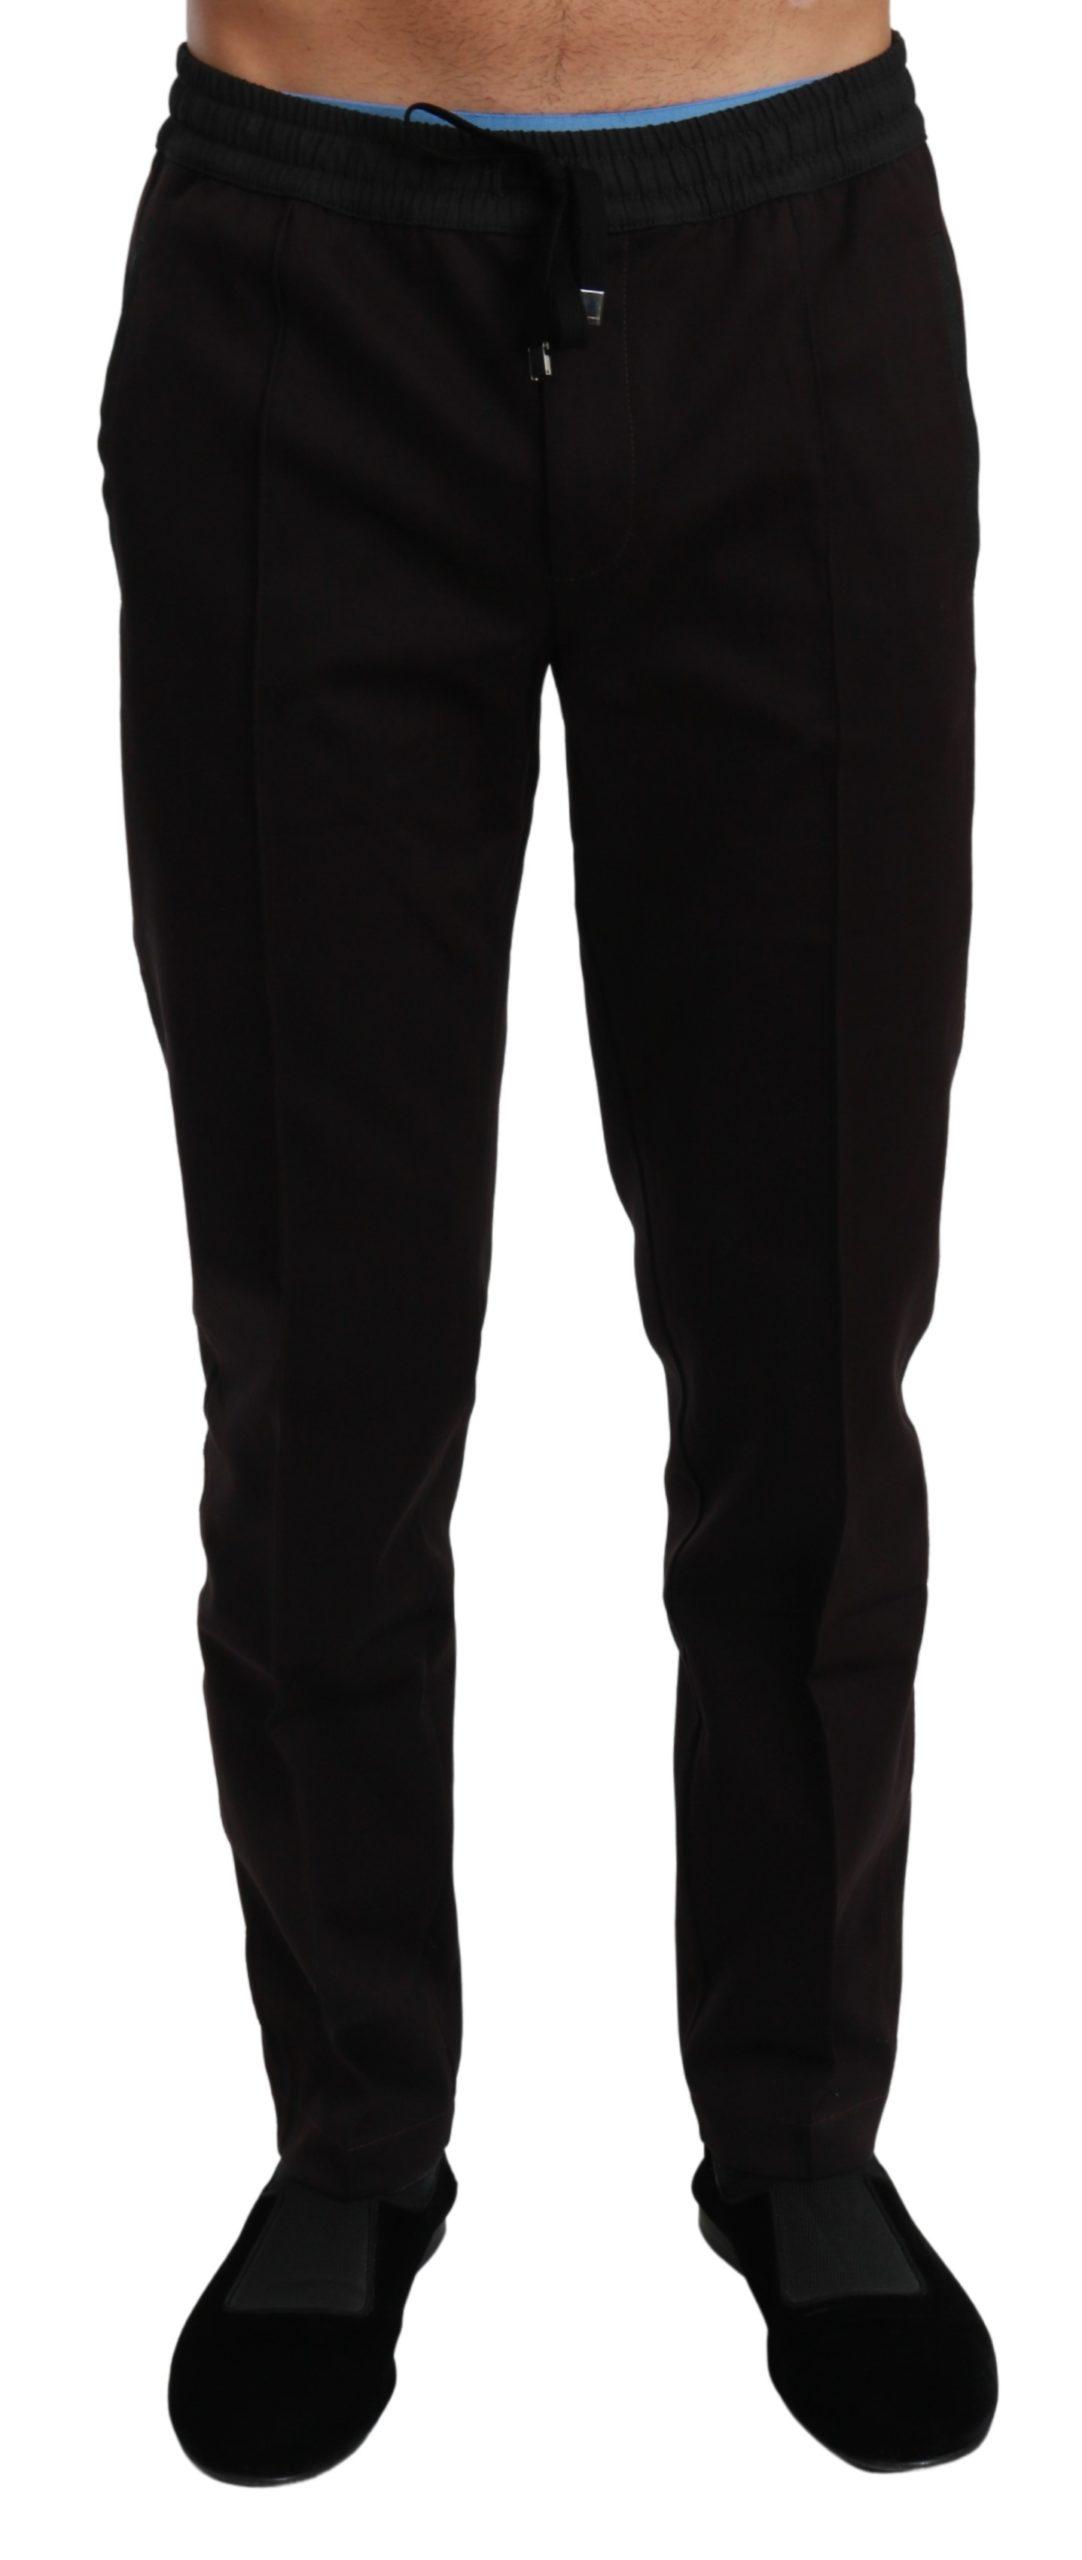 Dolce & Gabbana Men's Casual Cotton Trouser Purple PAN70978 - IT44   XS